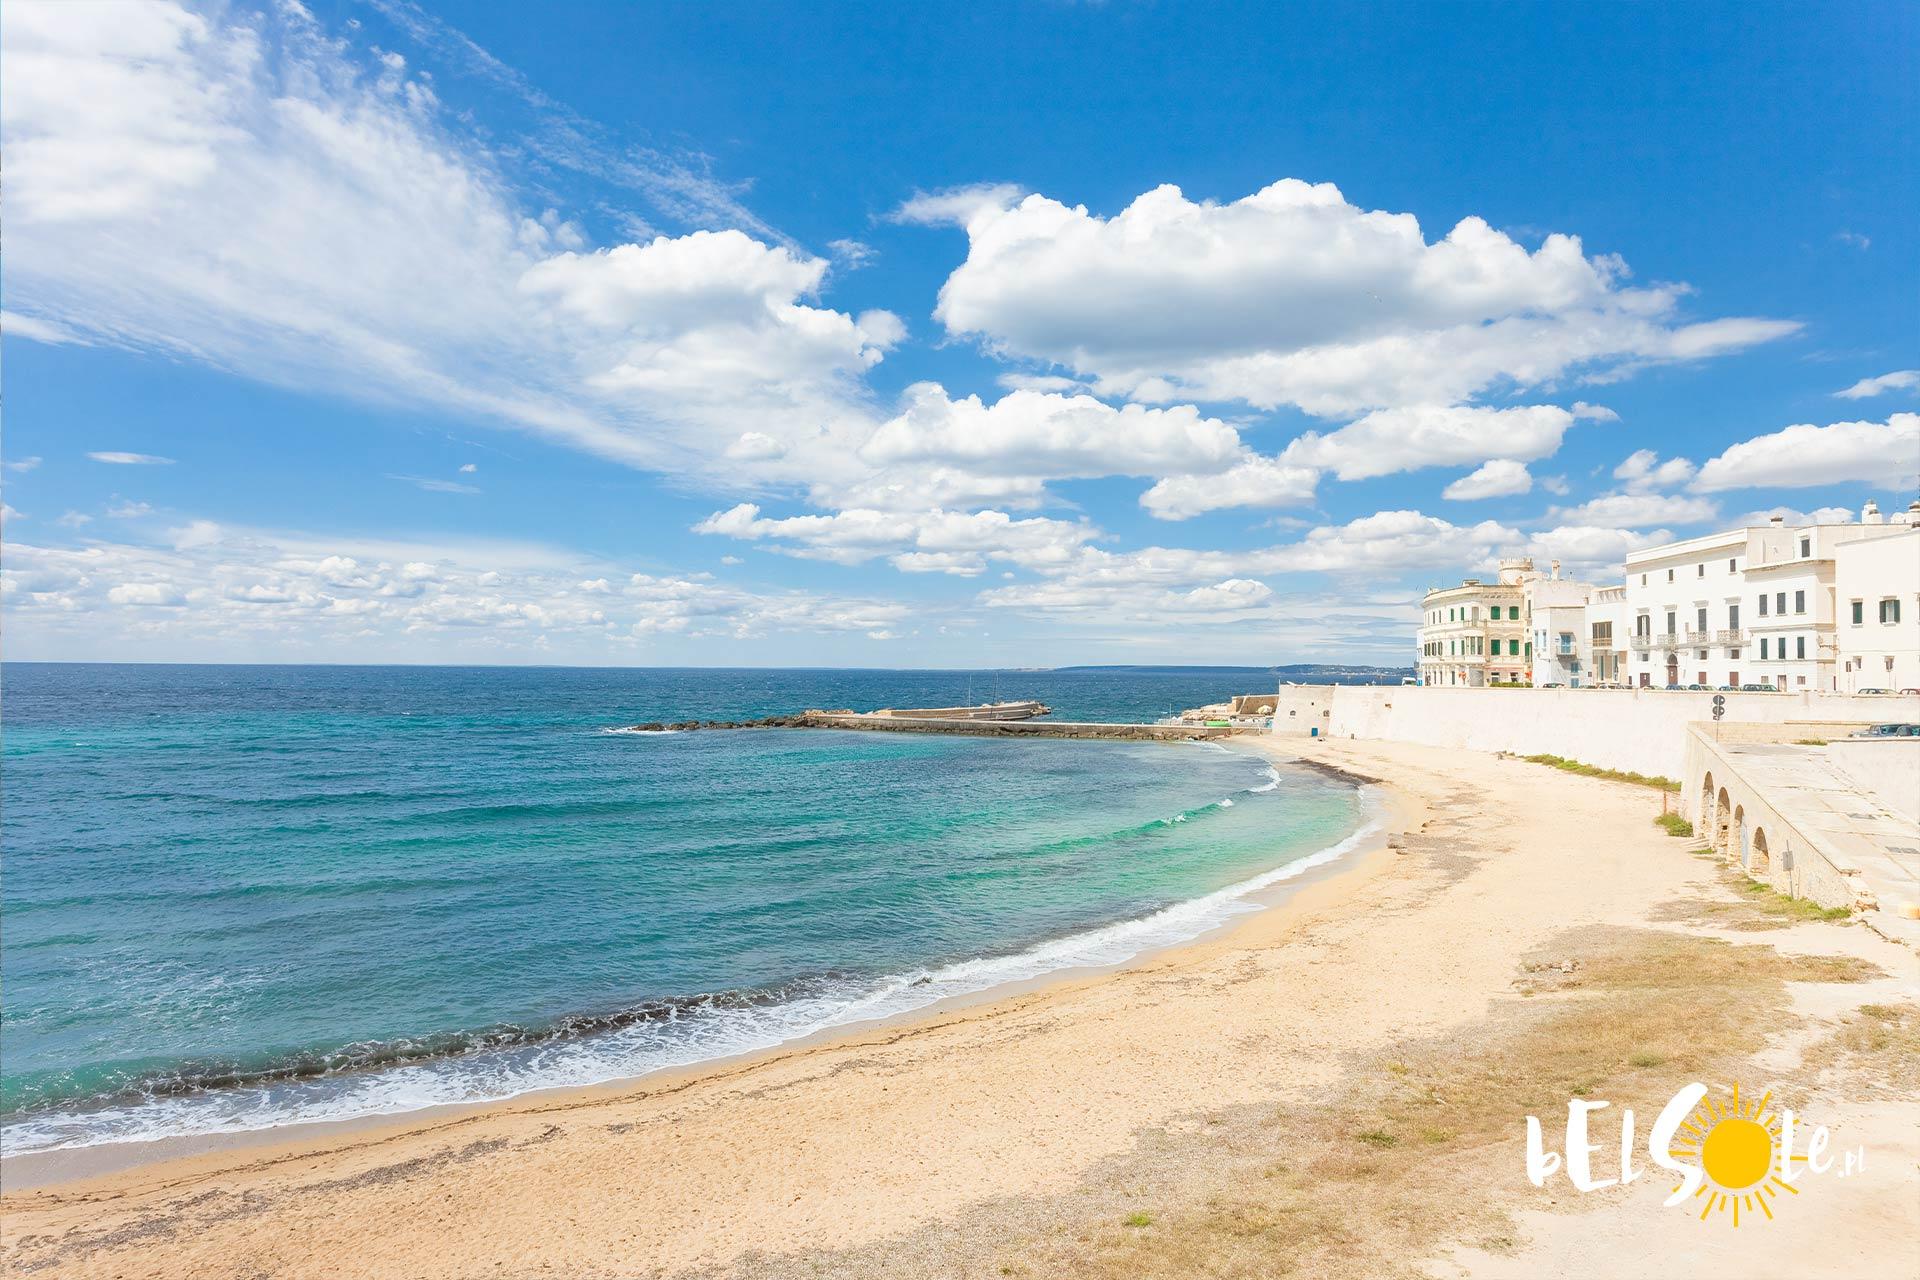 Gallipoli plaze